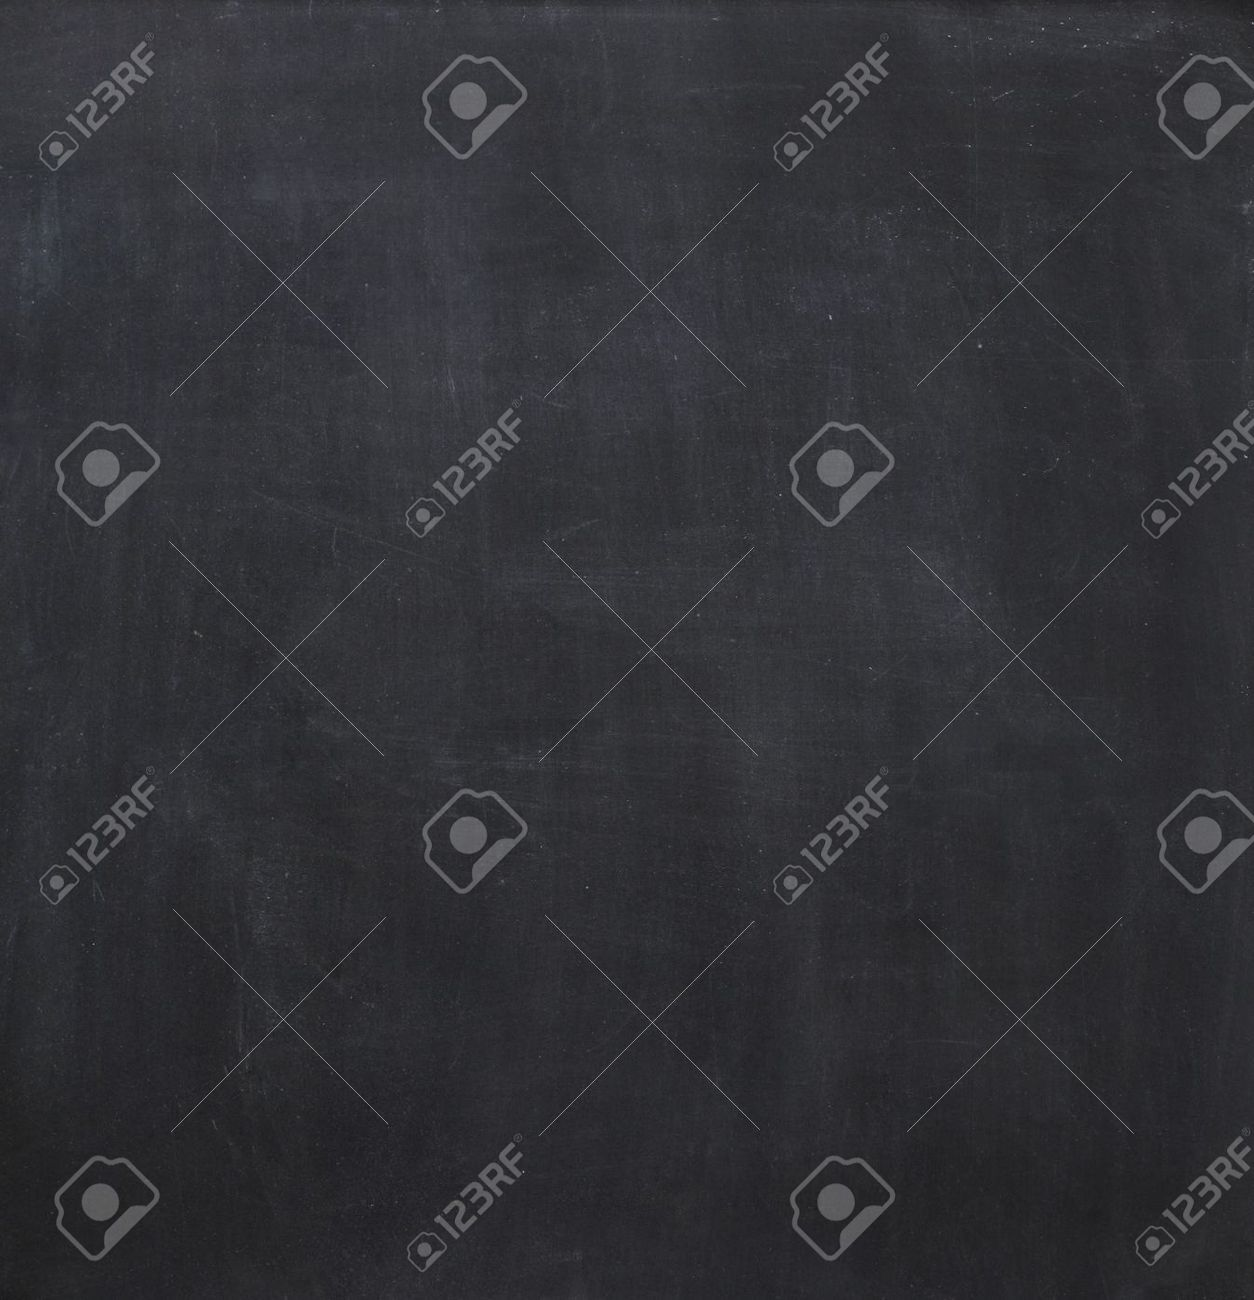 blank chalkboard blackboard texture background stock photo 21450585